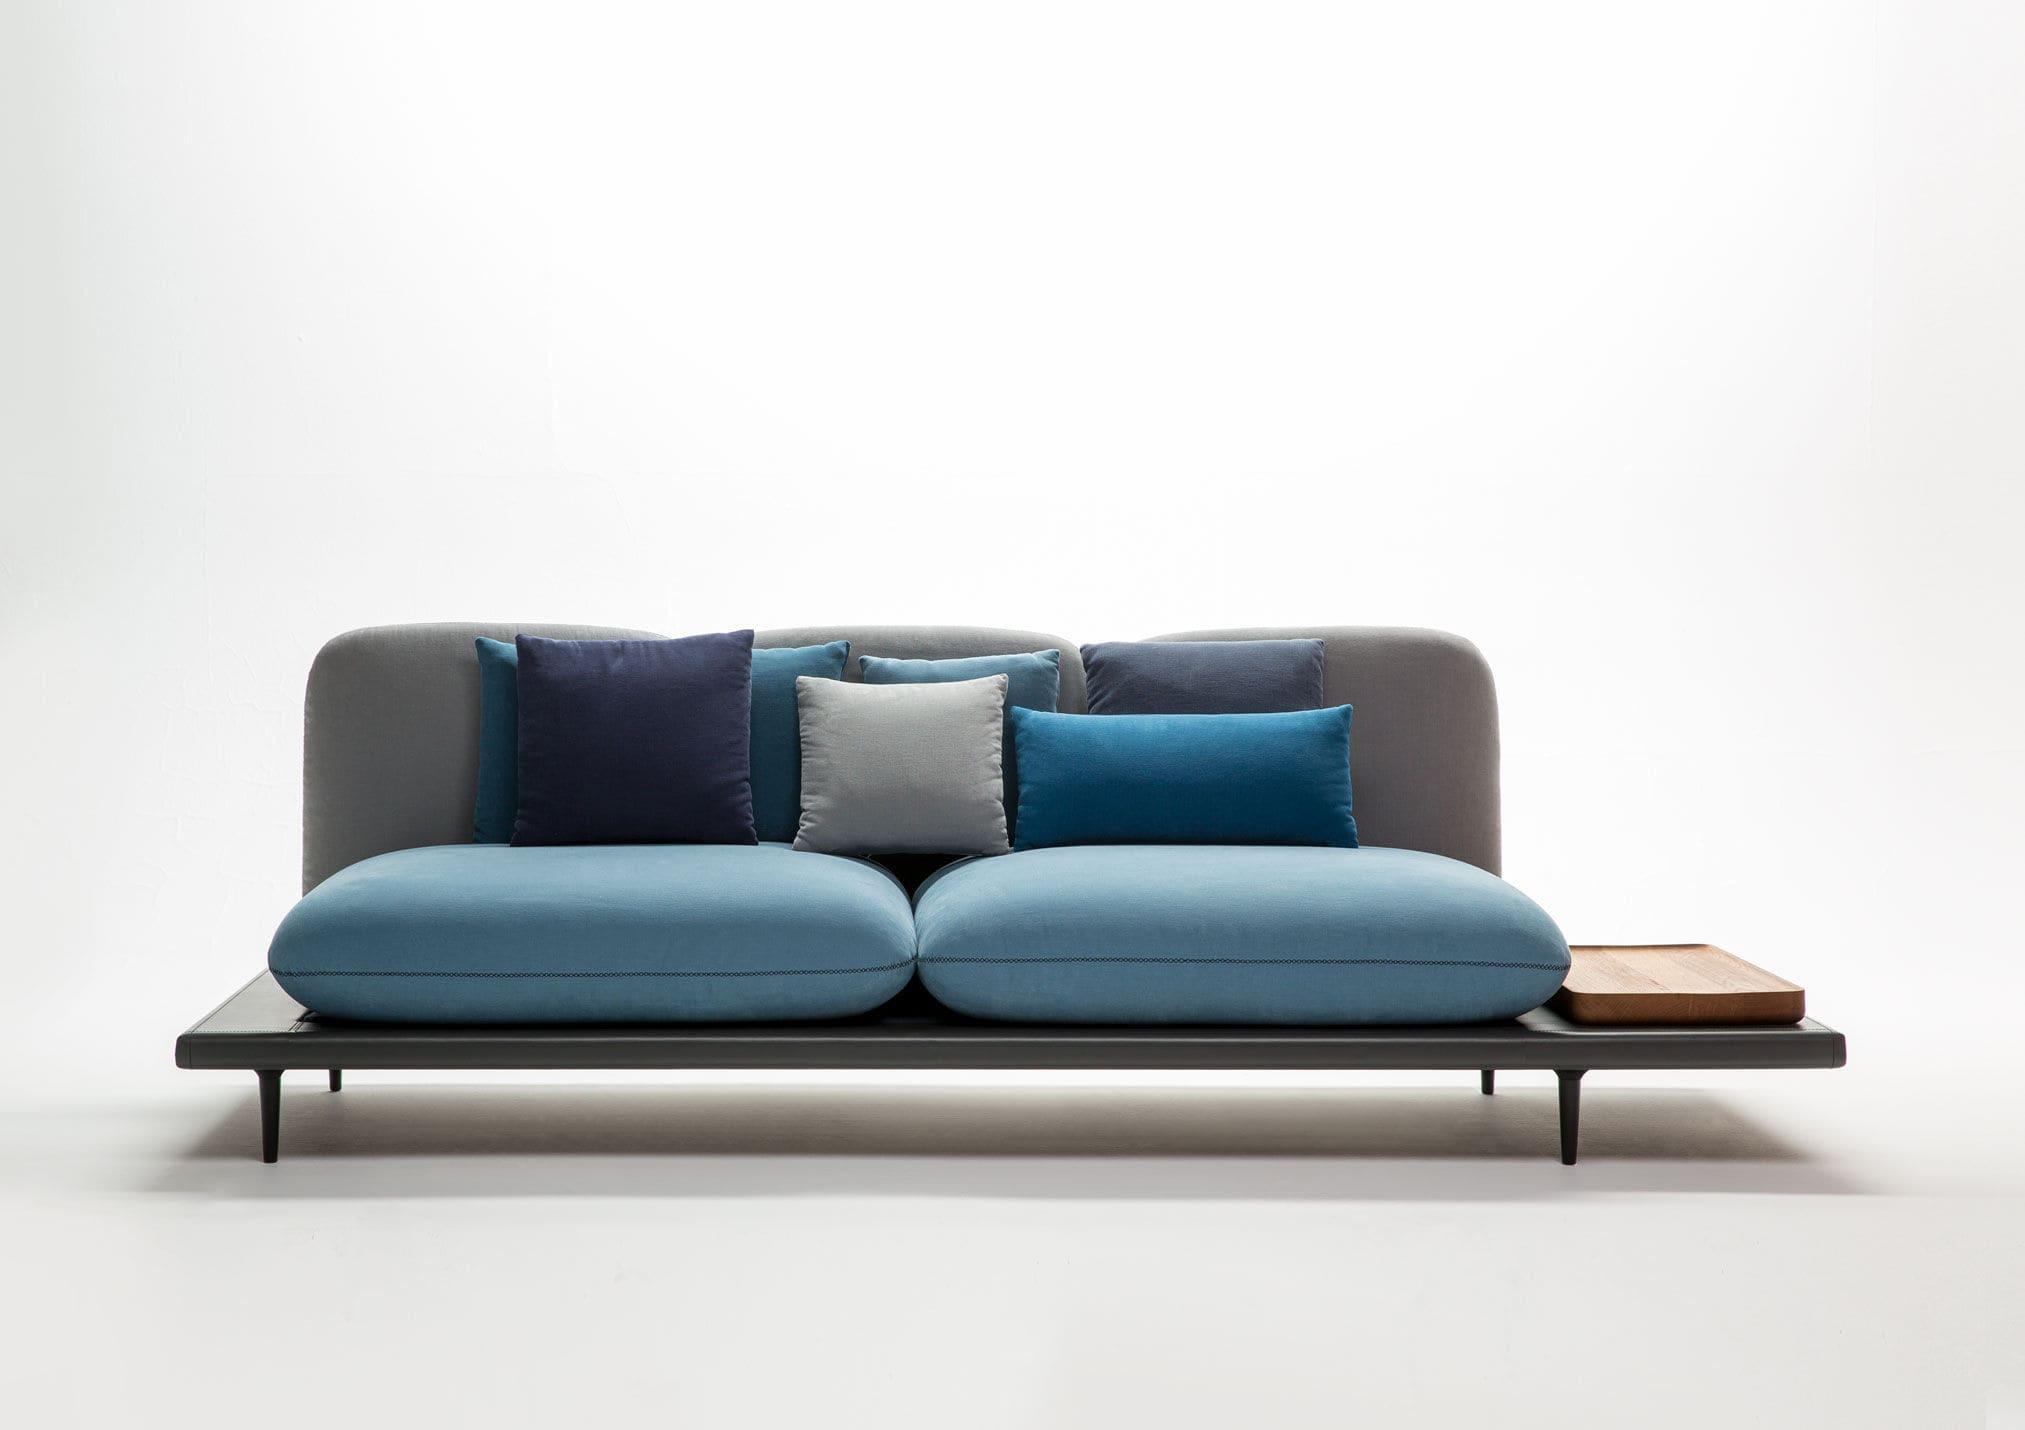 ... Original design sofa / leather / fabric / 3-seater SOFA4MANHATTAN by  Lera Moiseeva and ...